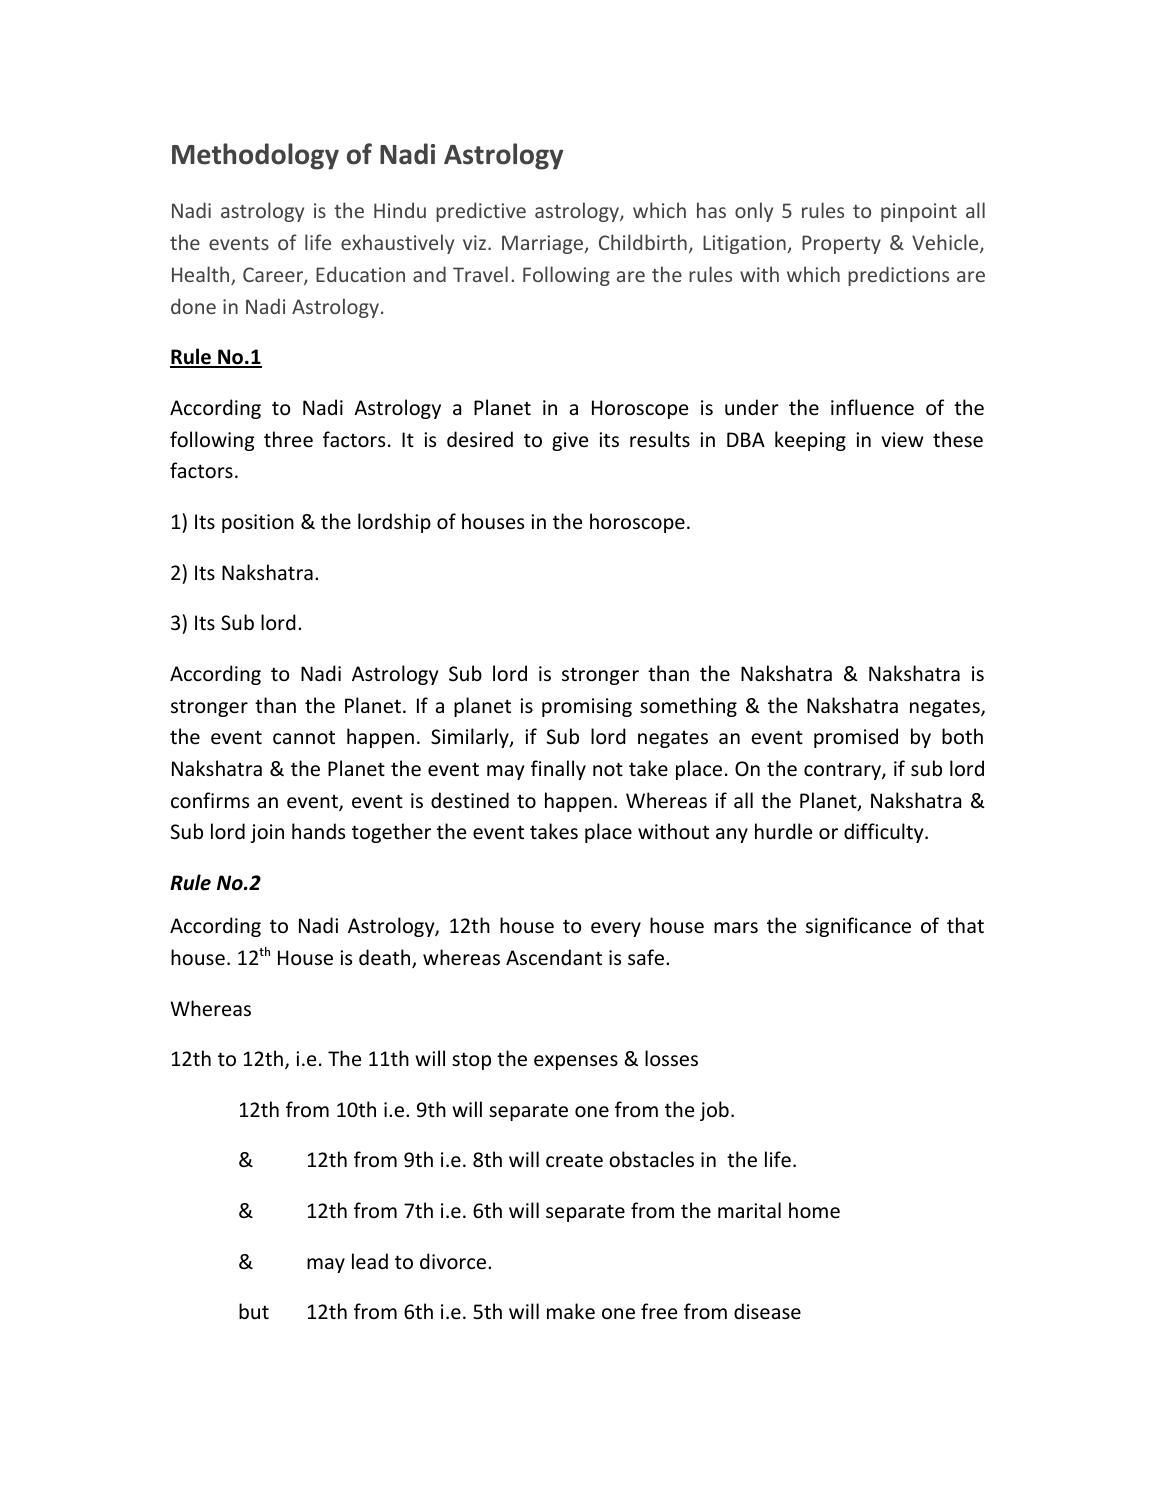 Nadi astrology predictive hindu astrology by KamalZafar - issuu